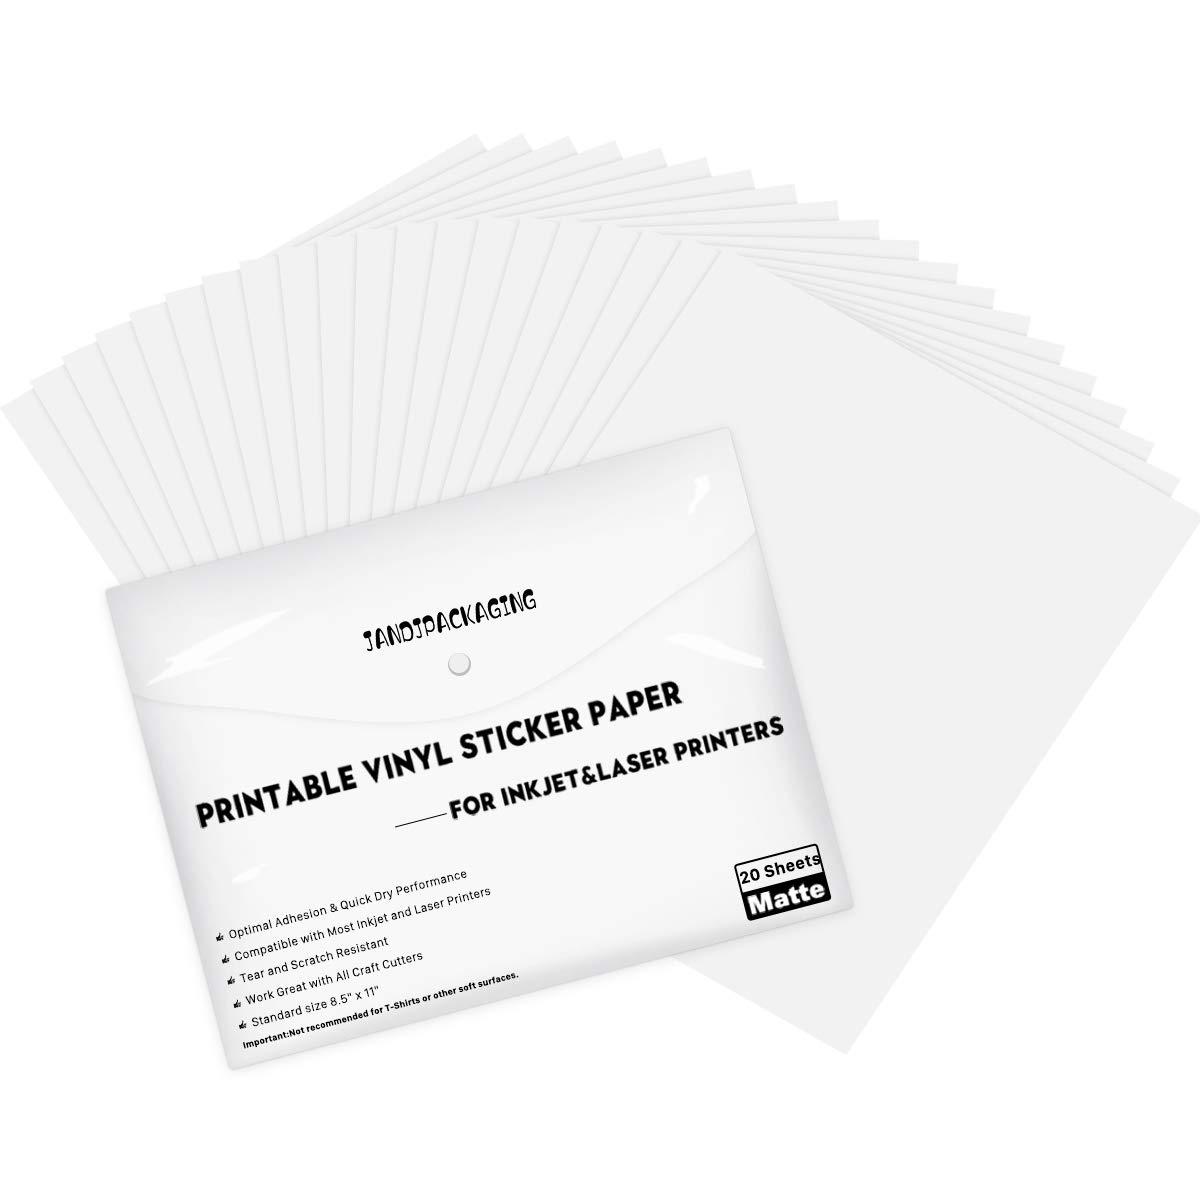 Printable Vinyl Sticker Paper Nashville-Davidson Mall for Inkjet Printer Cash special price 20 8.5